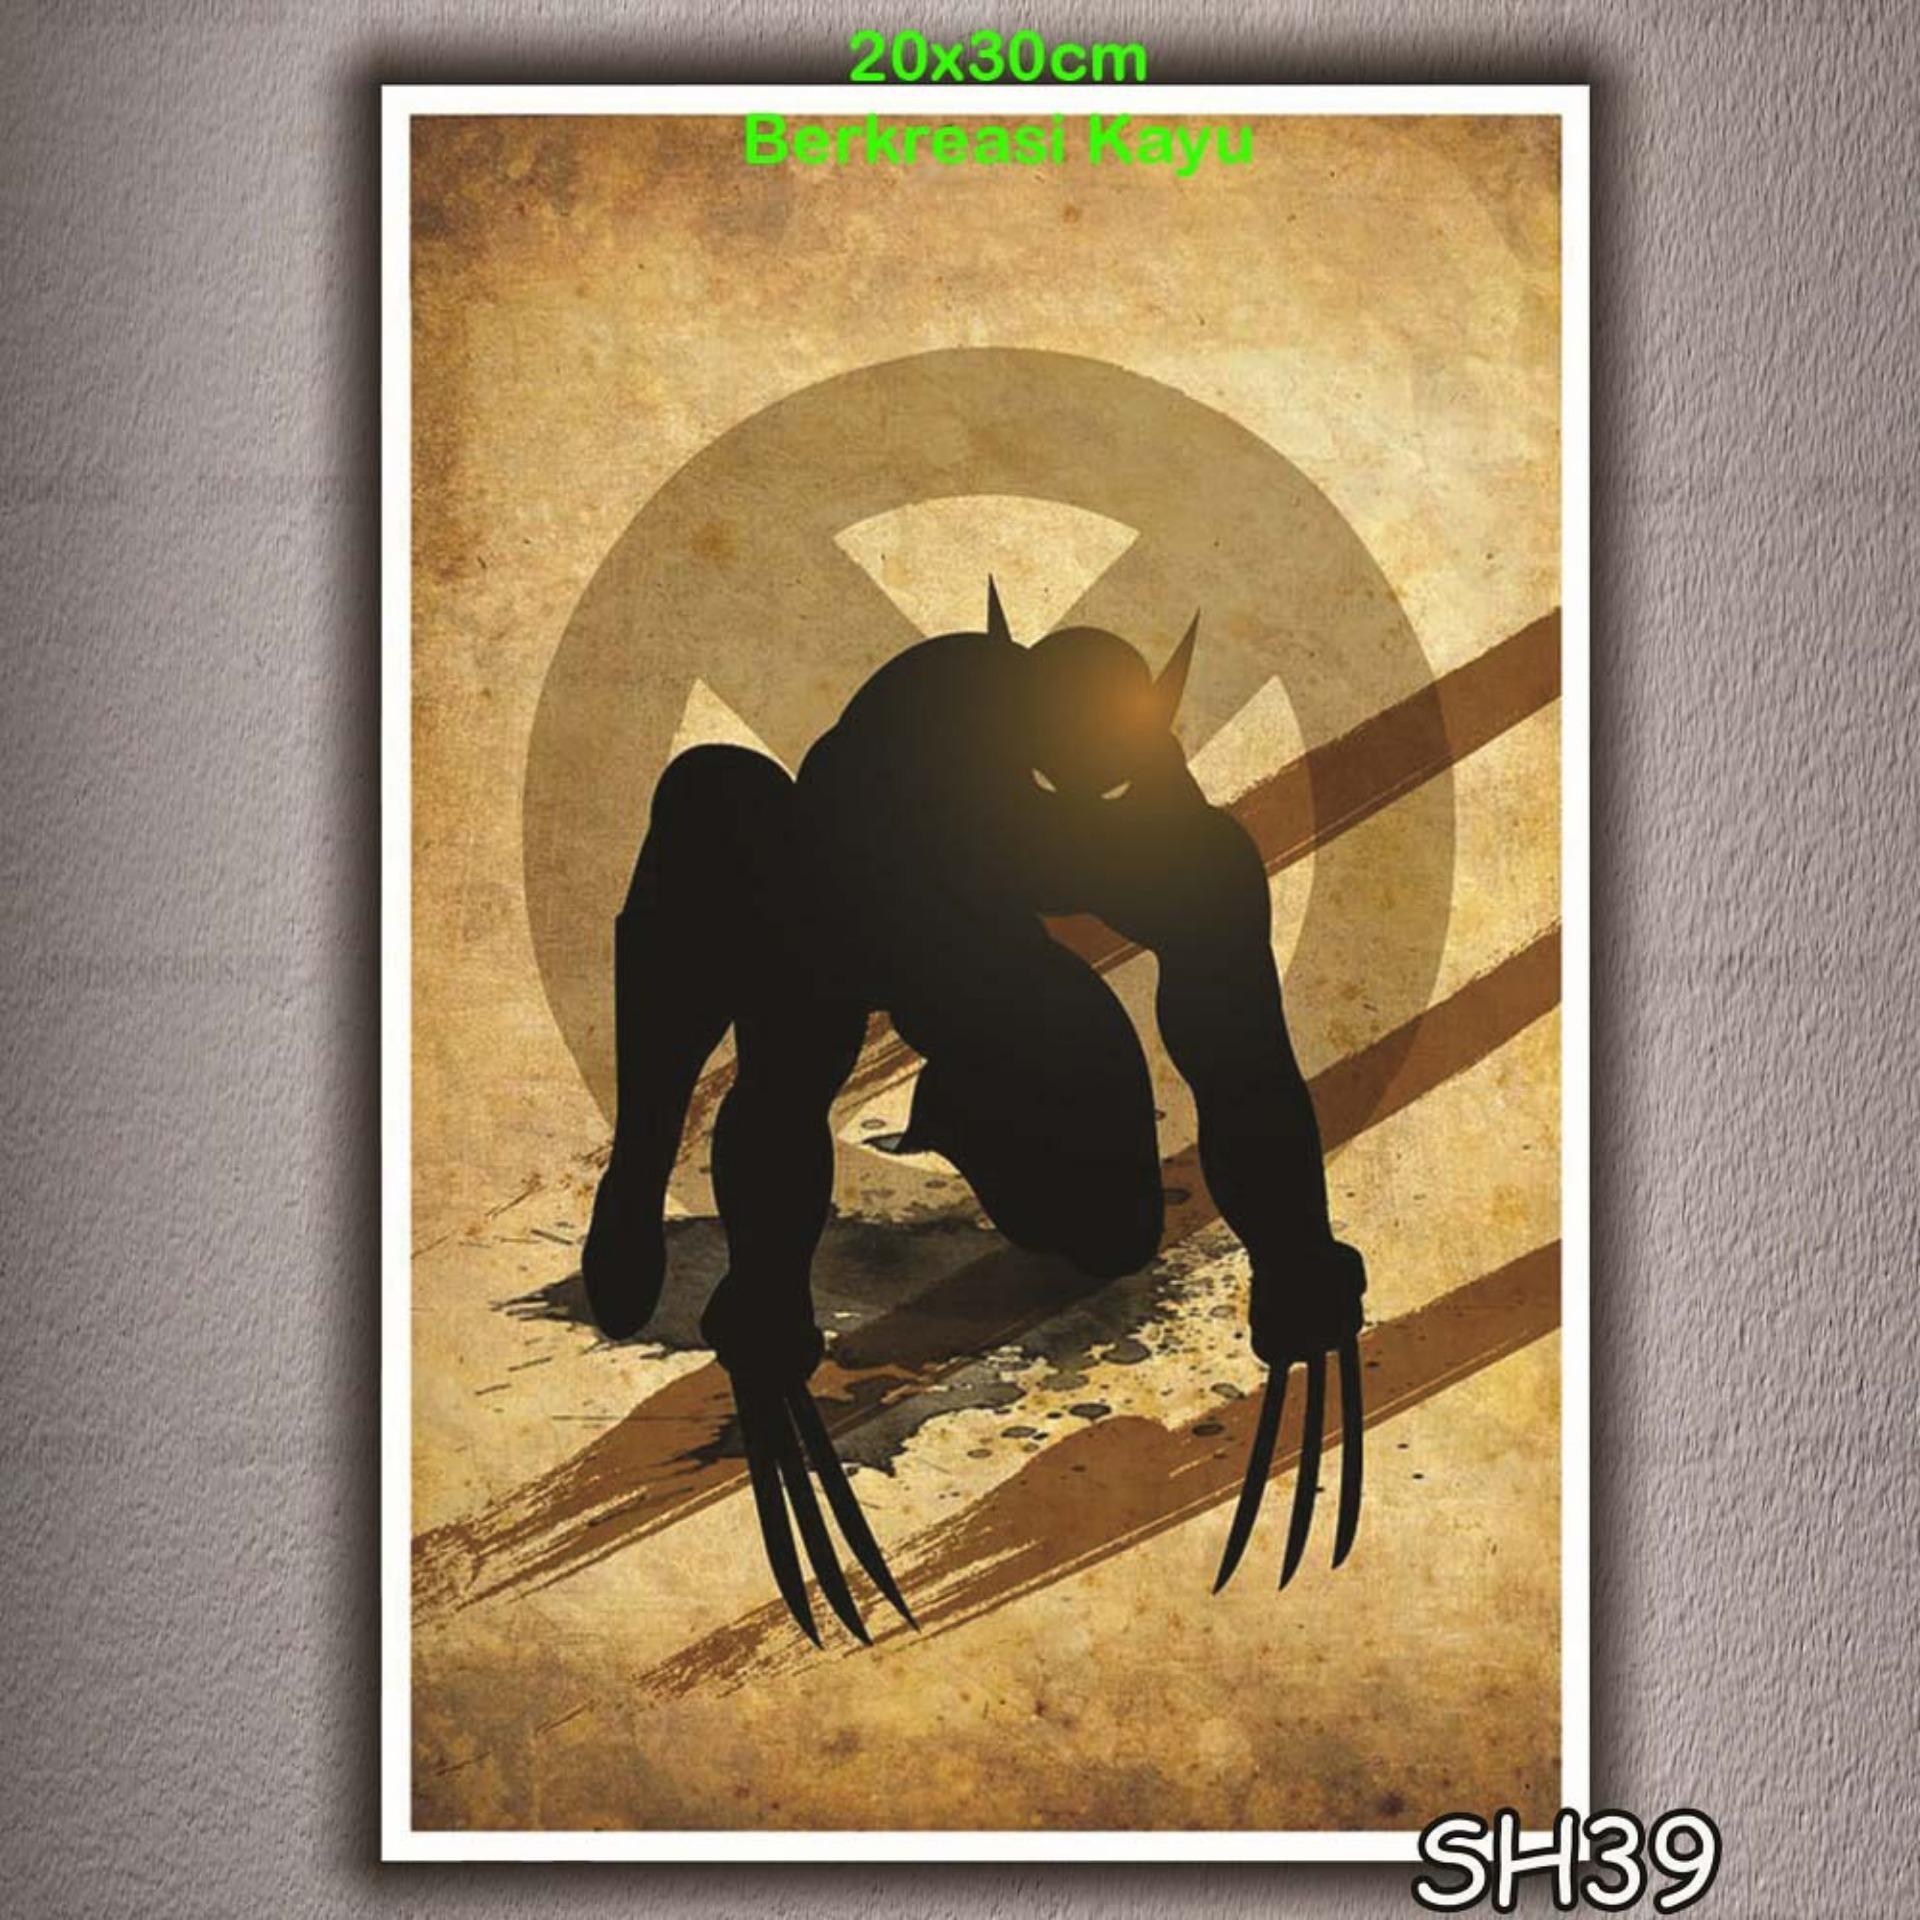 Vasty Hiasan Dinding Kayu Wall Decor Poster Super Hiro VSH-39